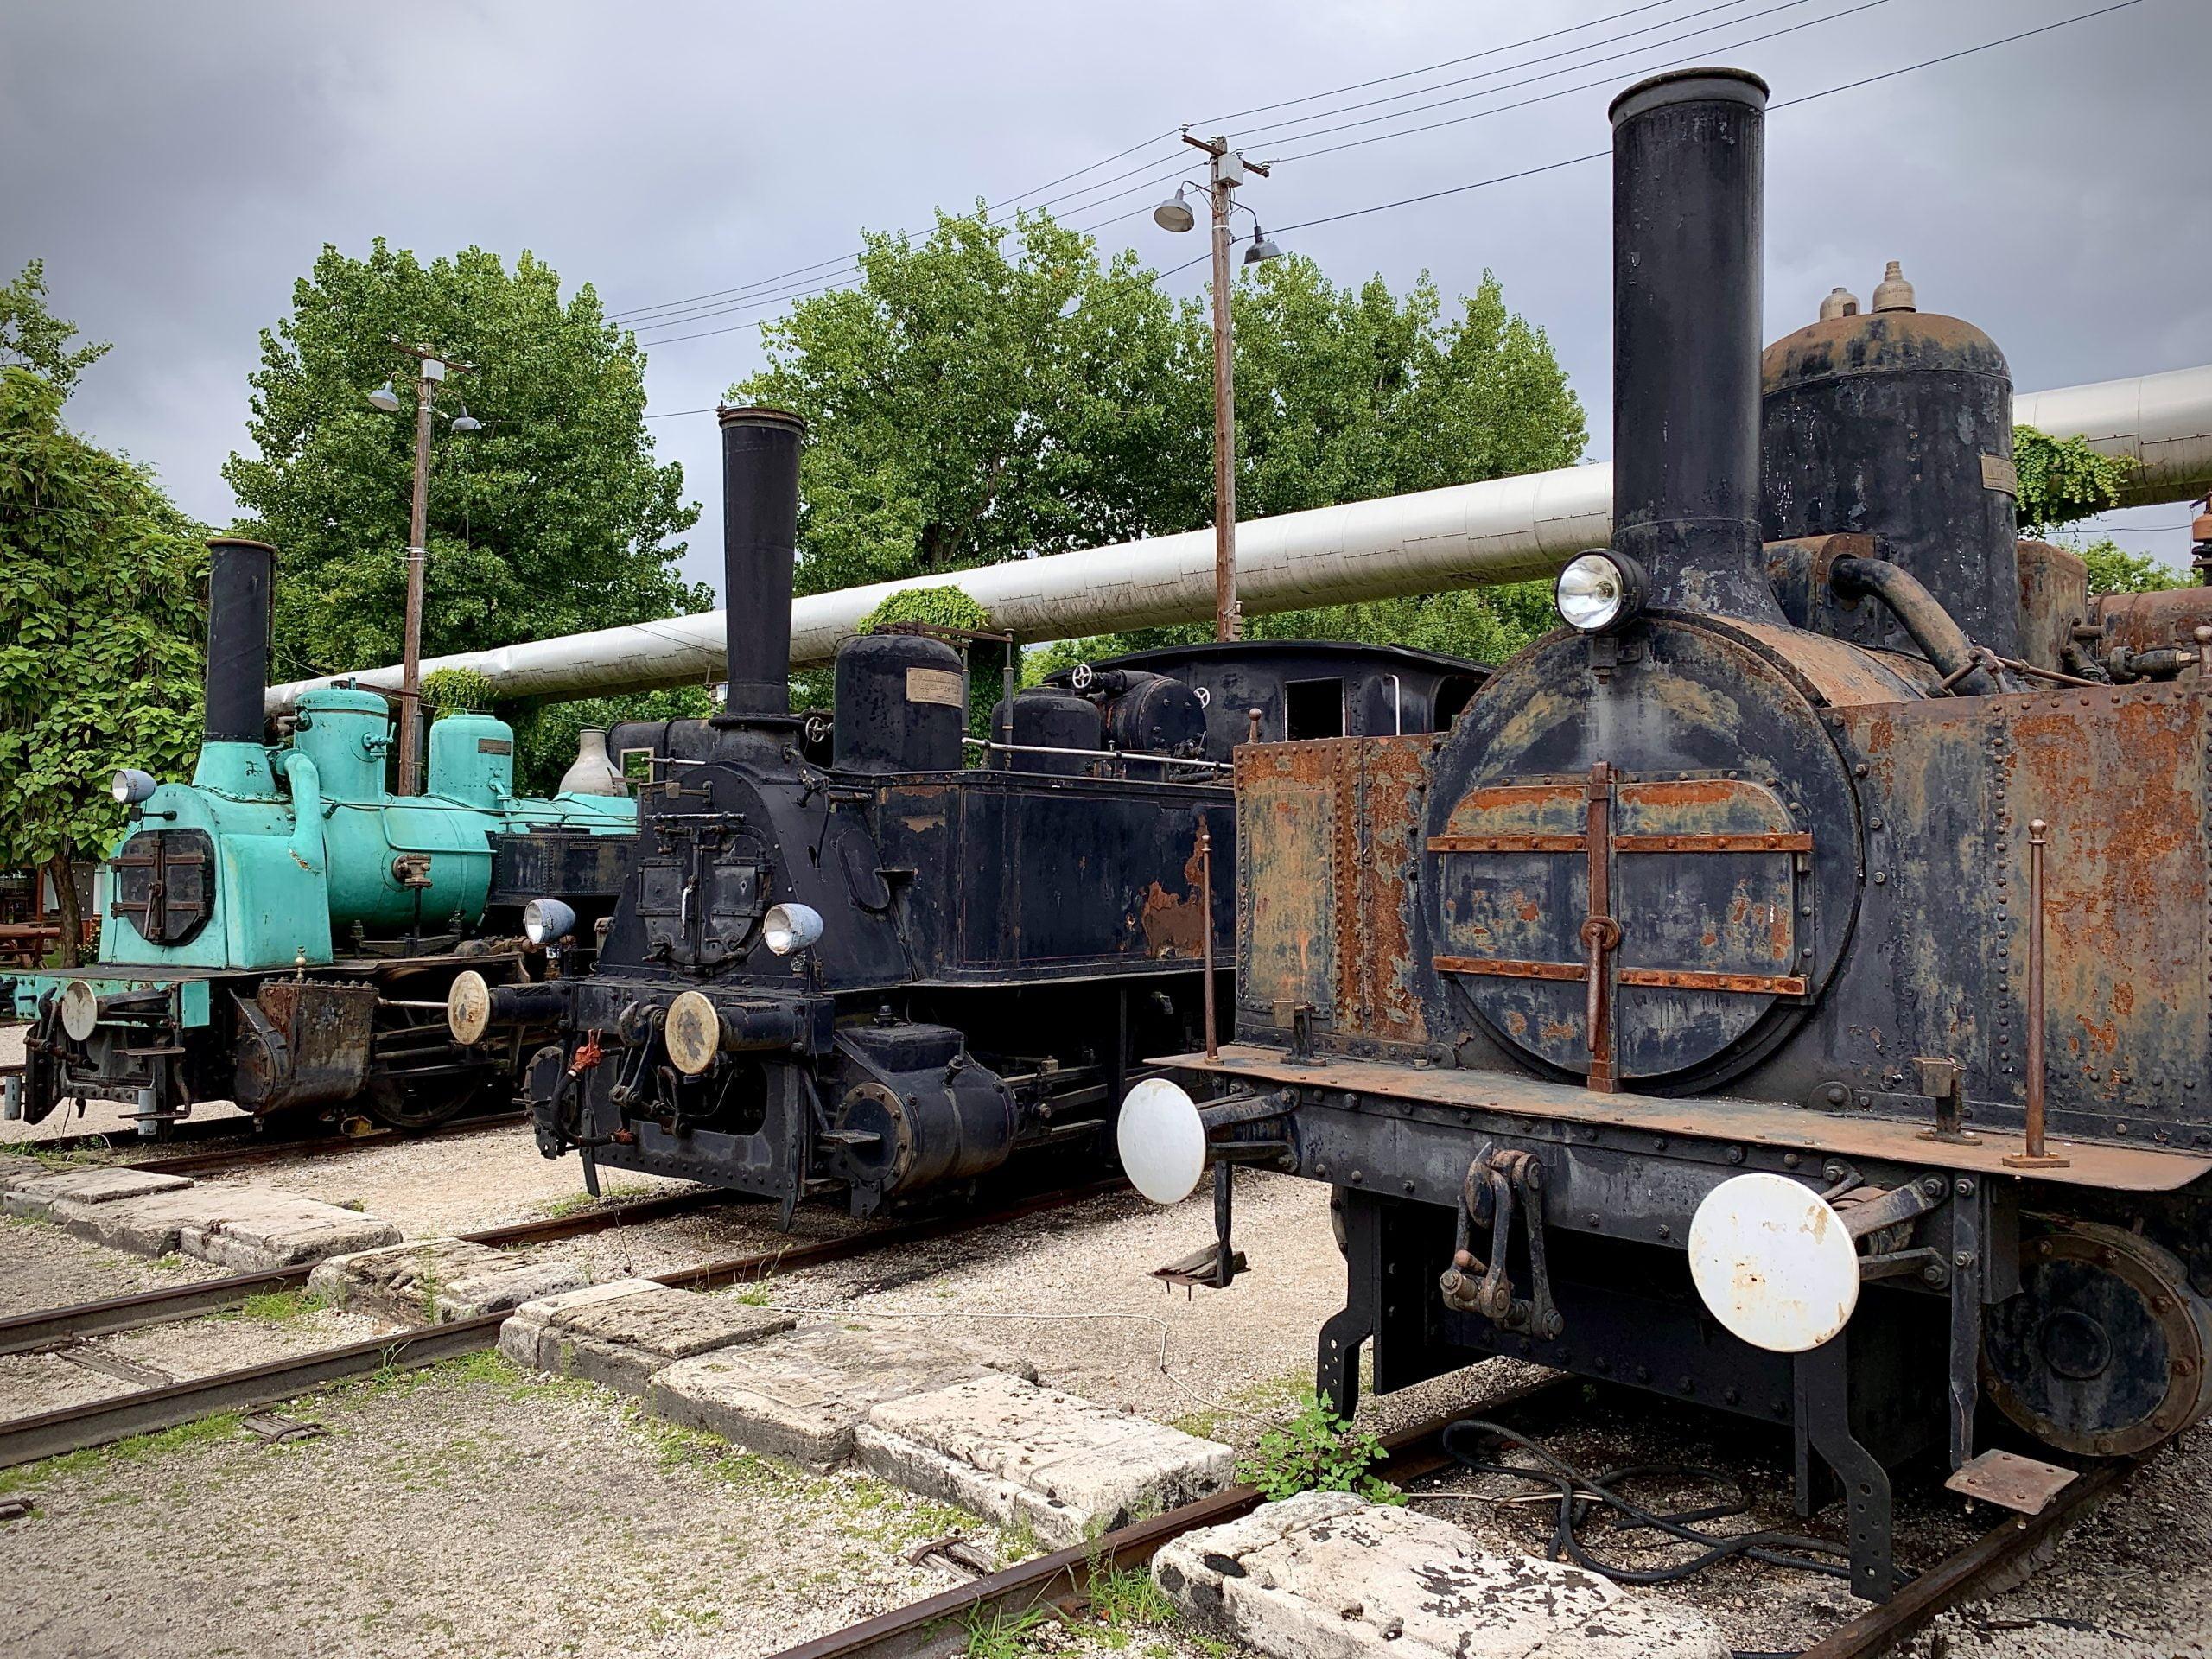 Locomotiva a vapore esposta nel museo